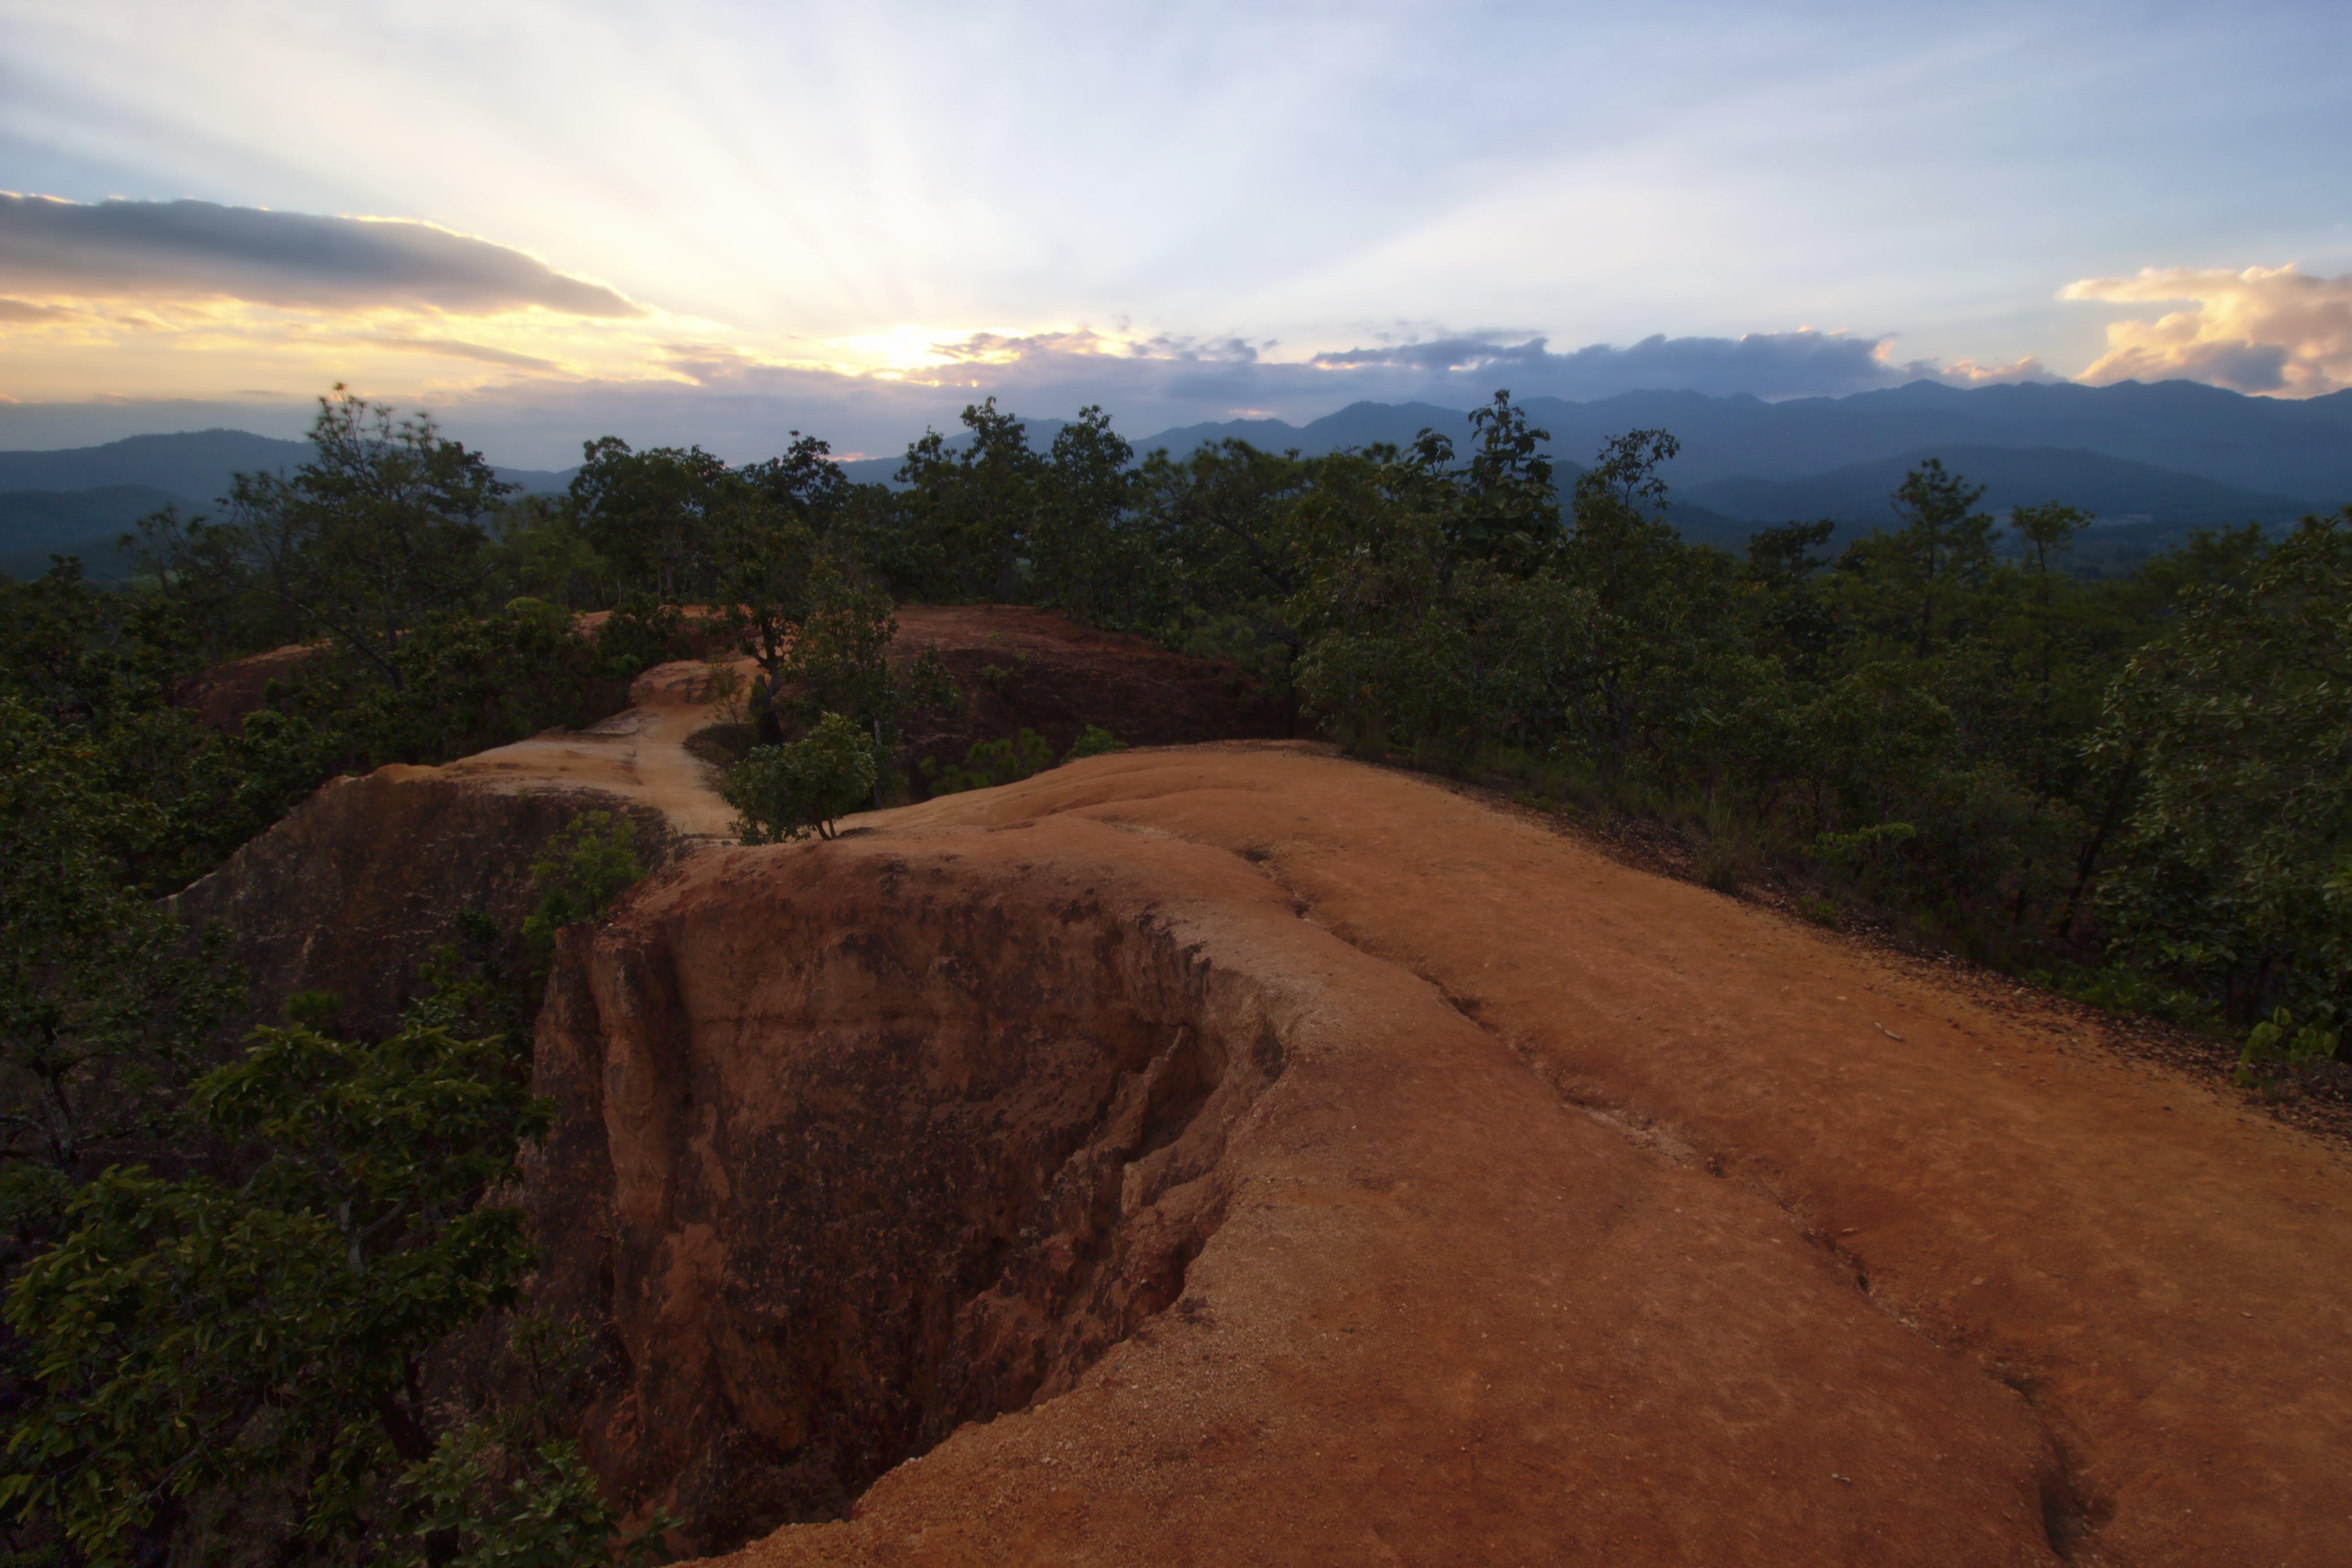 Rock Formation Pathway Between Trees Under Crepuscular Wallpaper